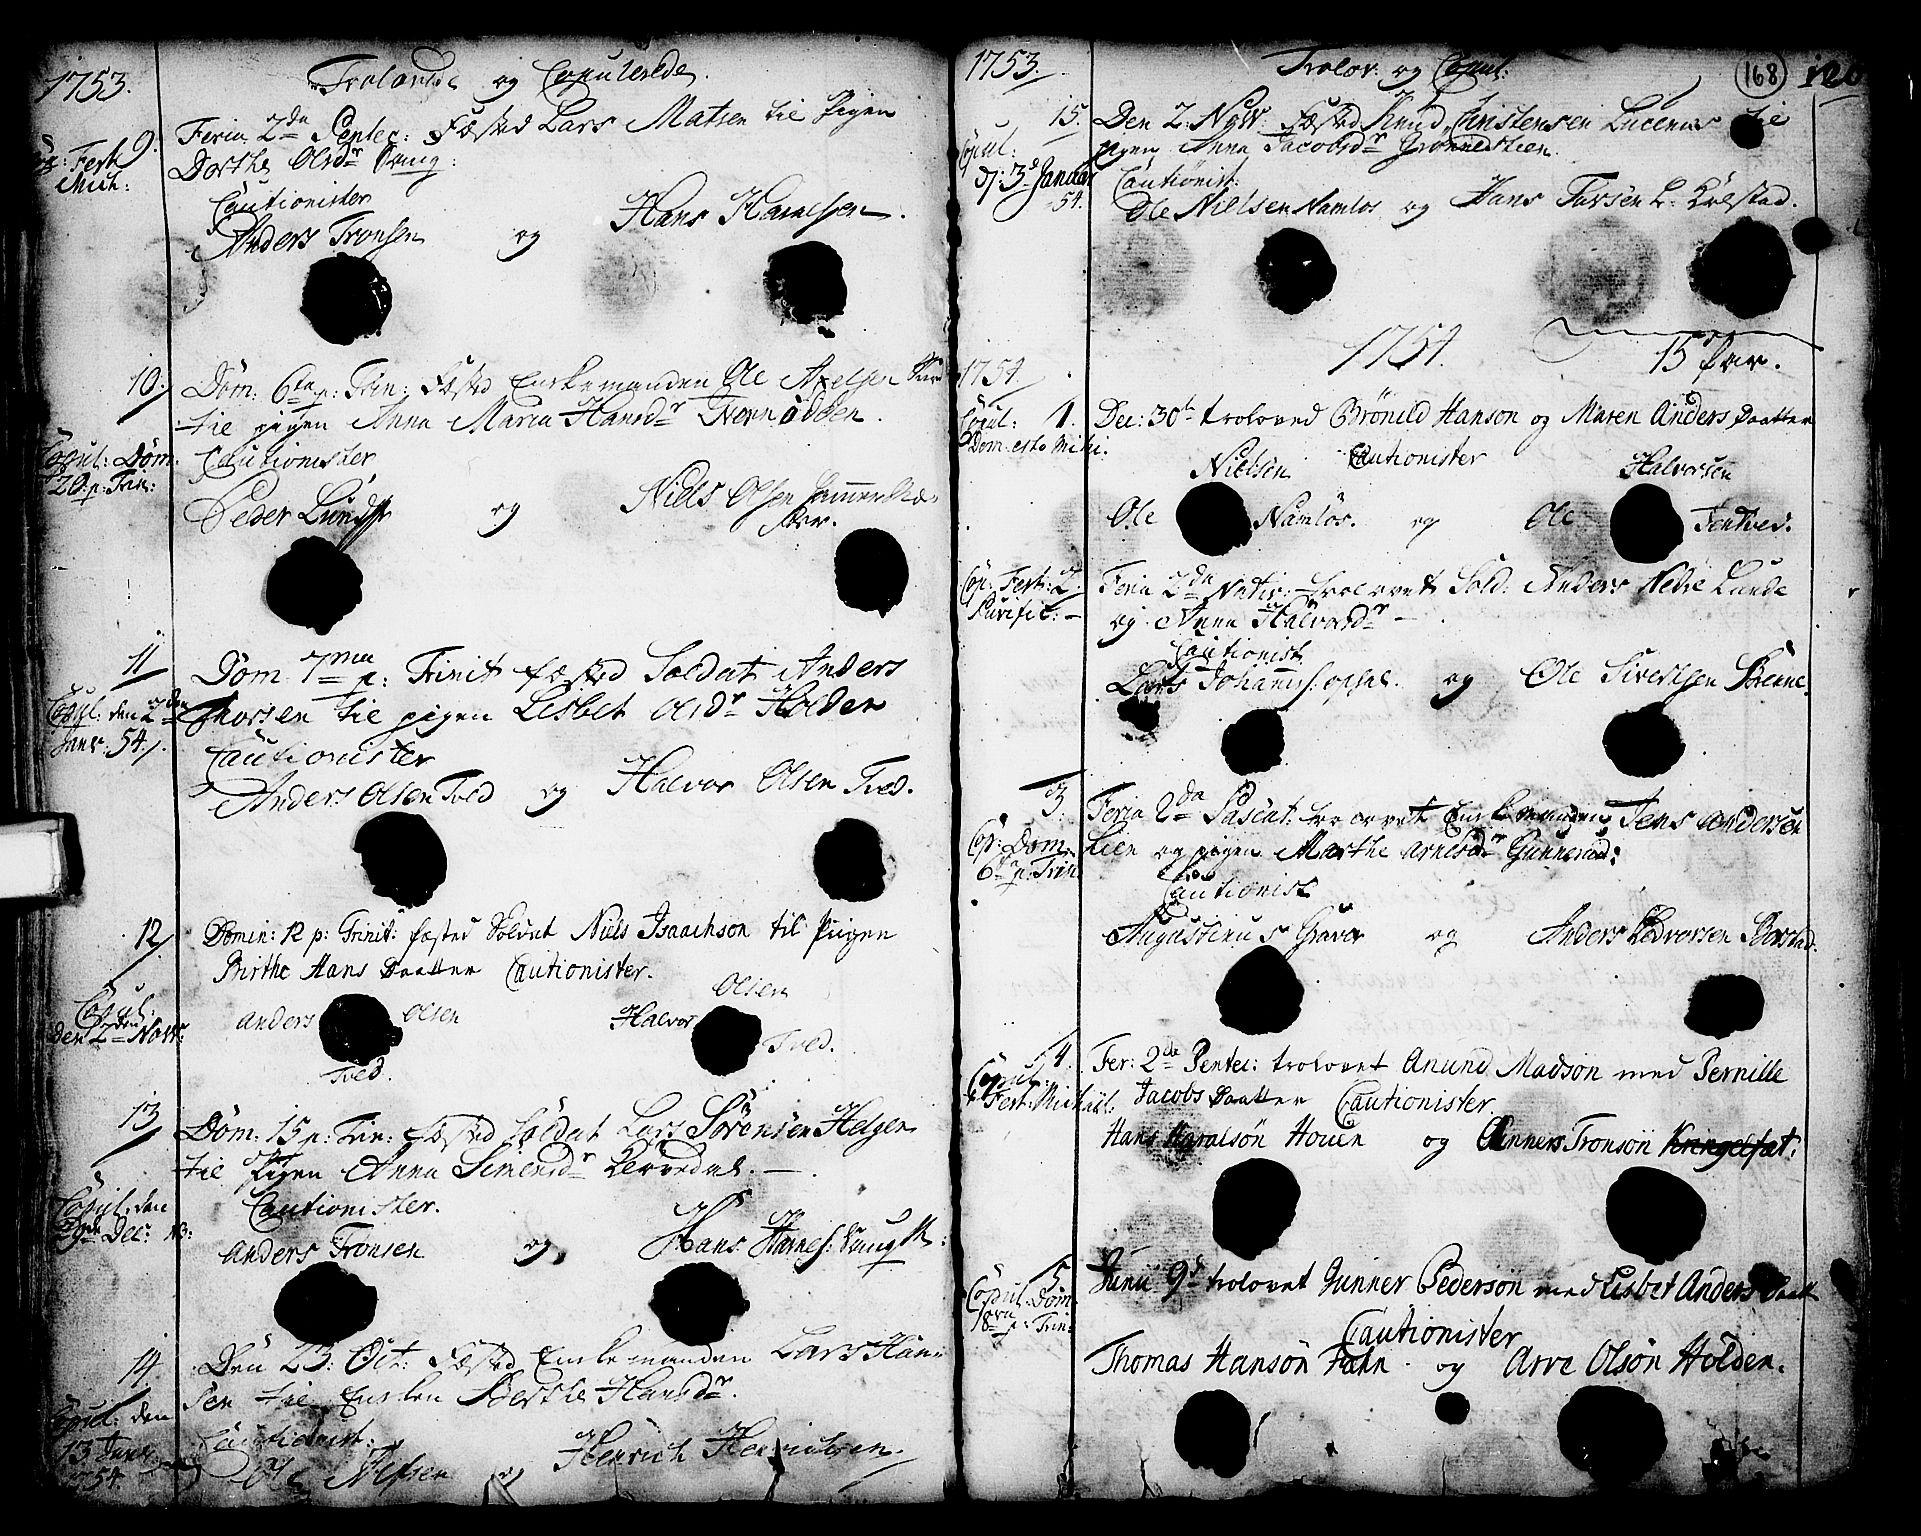 SAKO, Holla kirkebøker, F/Fa/L0001: Ministerialbok nr. 1, 1717-1779, s. 168